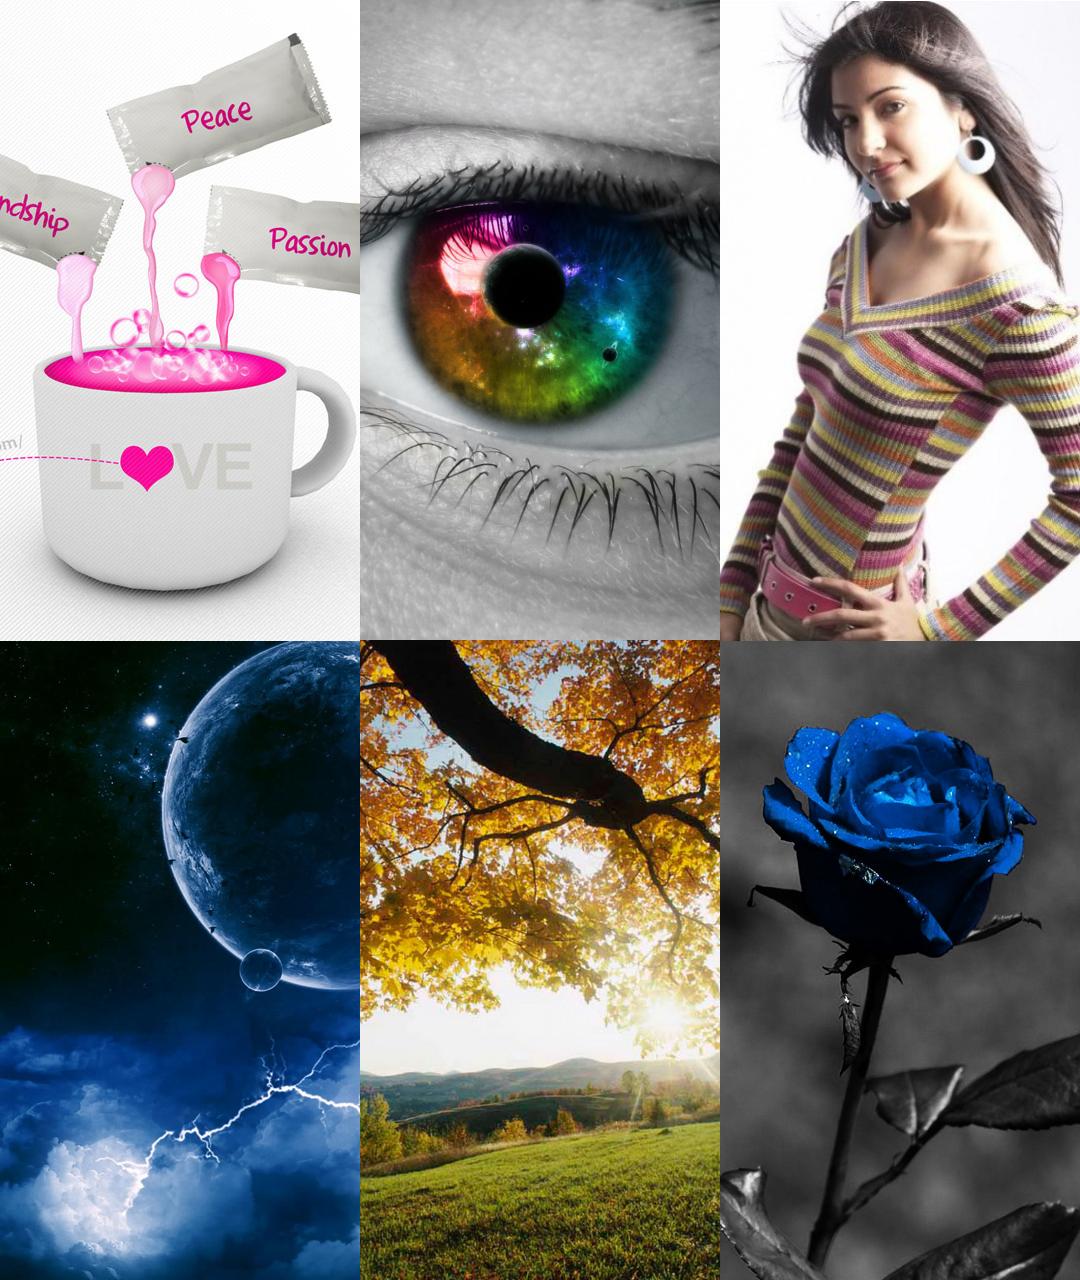 http://1.bp.blogspot.com/-7Km1wRqIjuI/TjZd6N4OjhI/AAAAAAAAAMo/yheZ23RHvI4/s1600/Mix+Mobile+Wallpaper+360x640.png